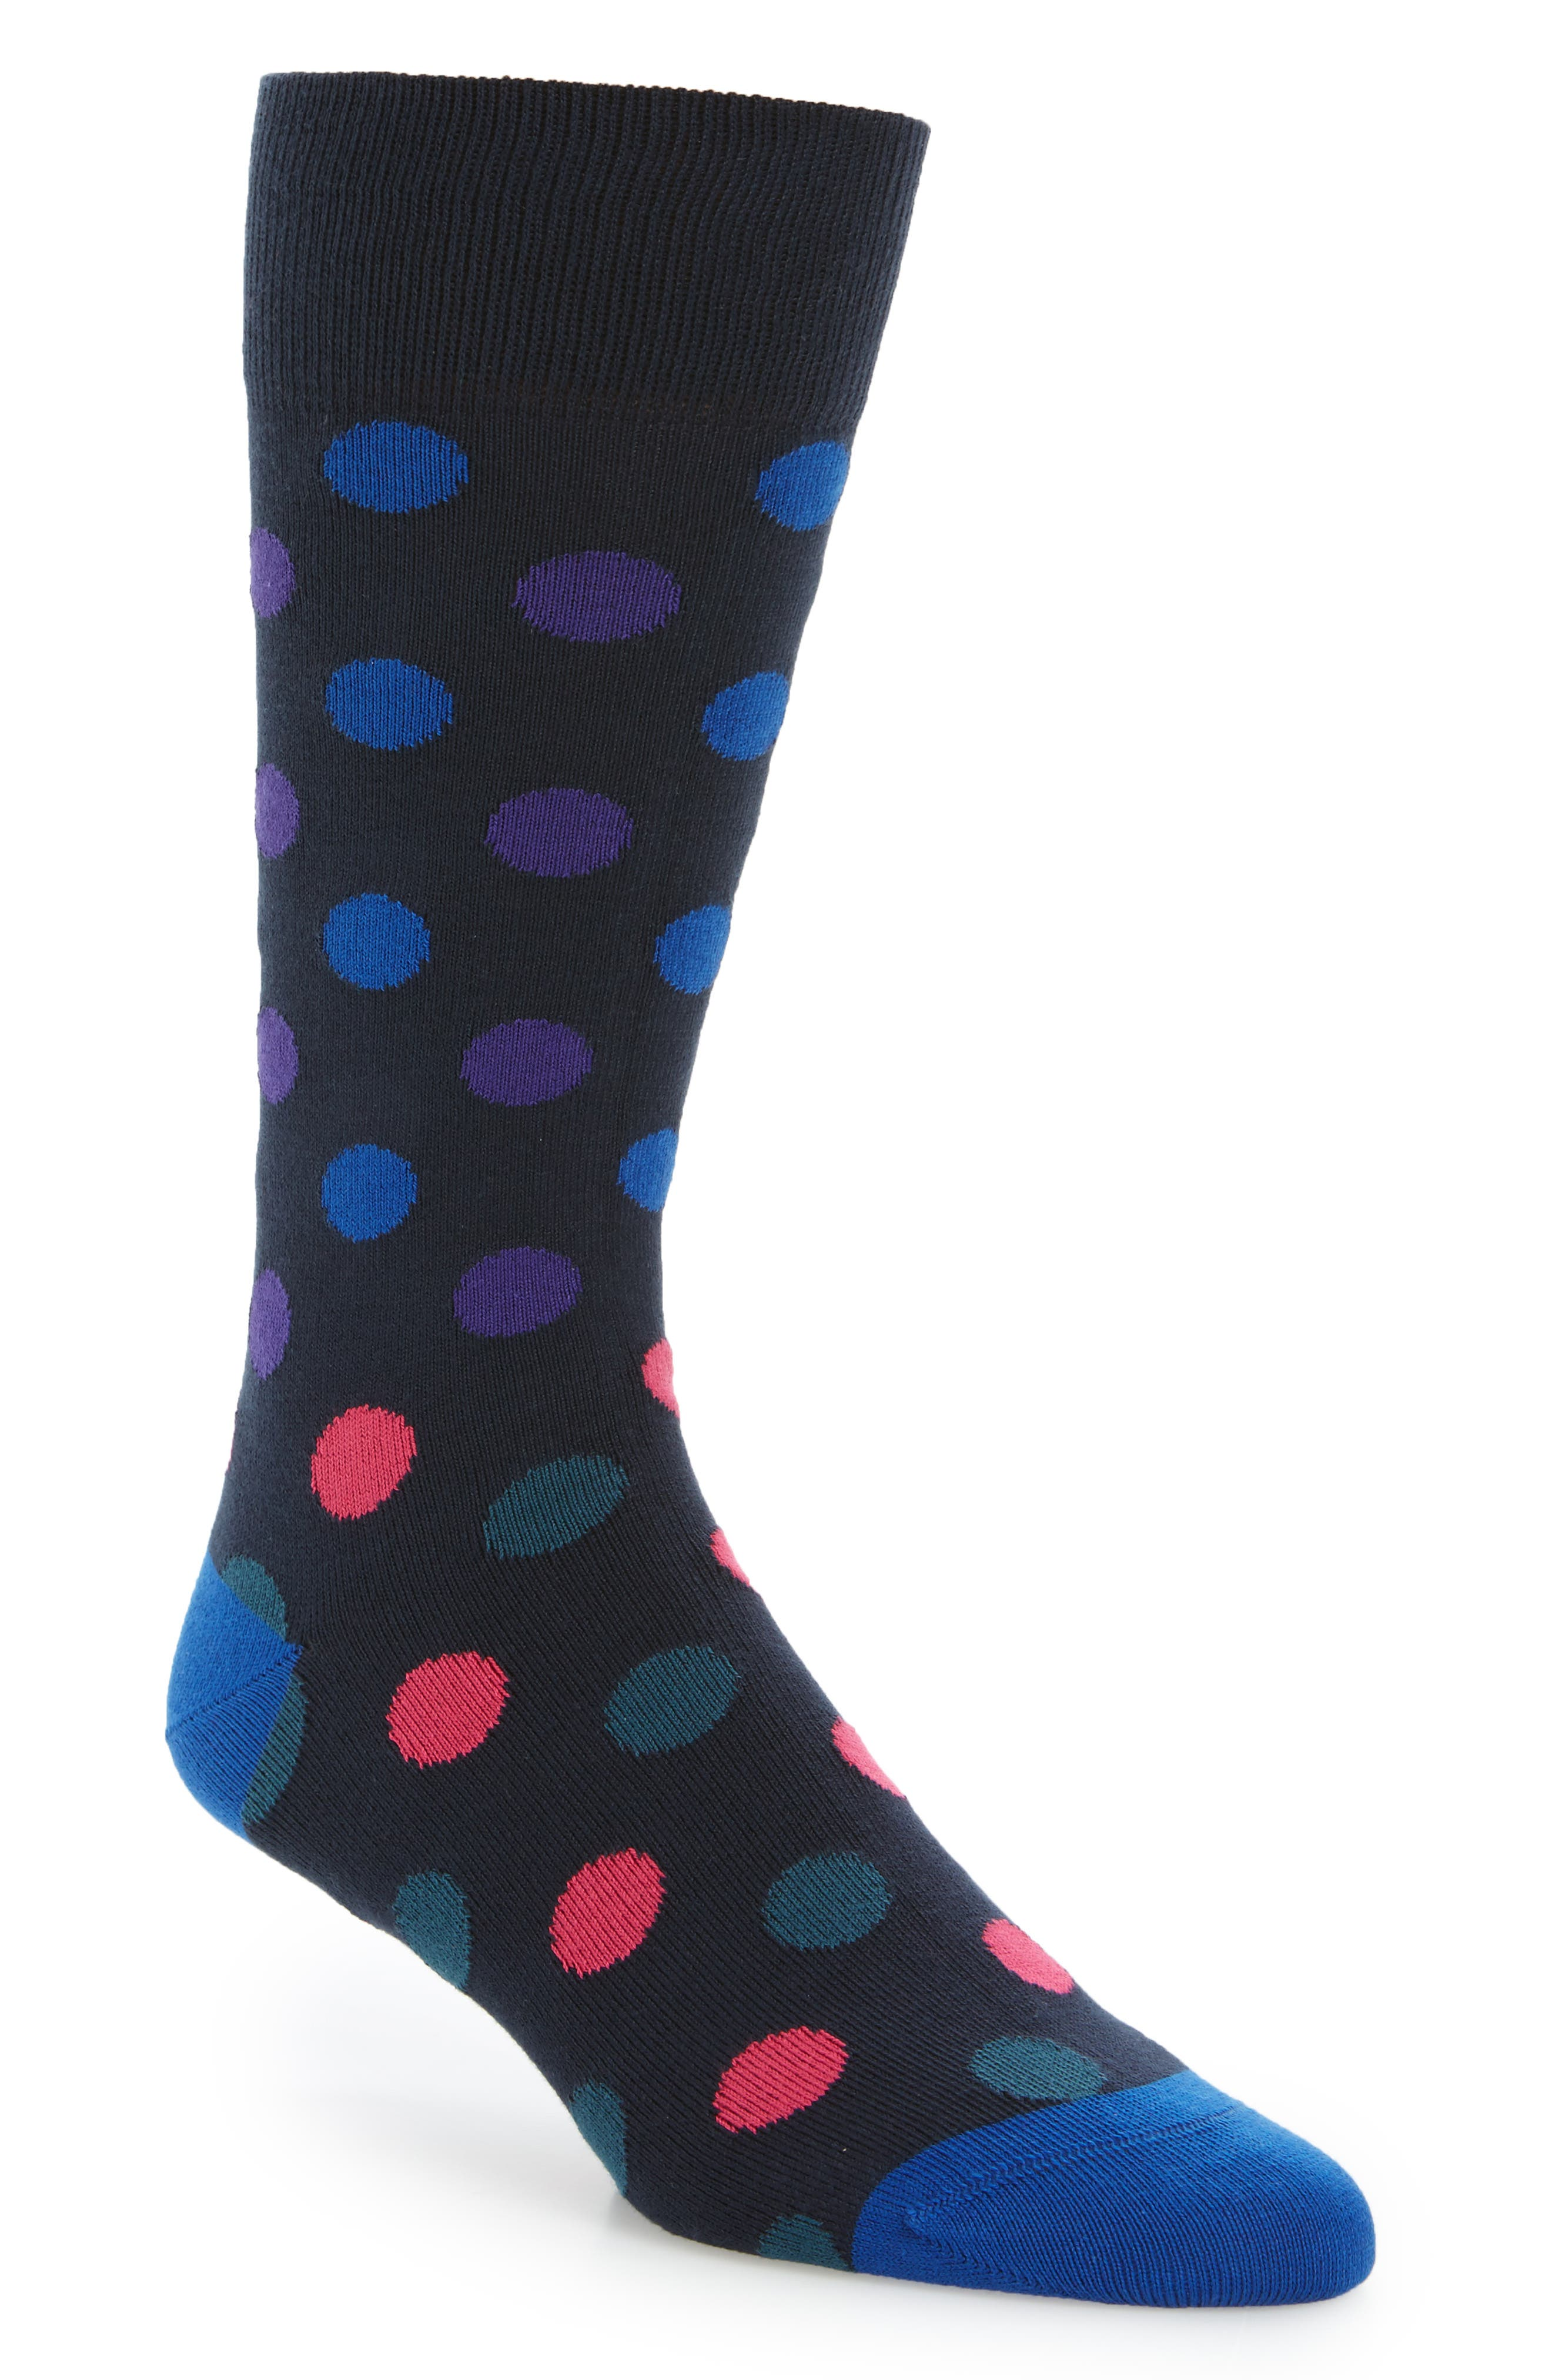 Samic Polka Dot Socks,                             Main thumbnail 1, color,                             Blue